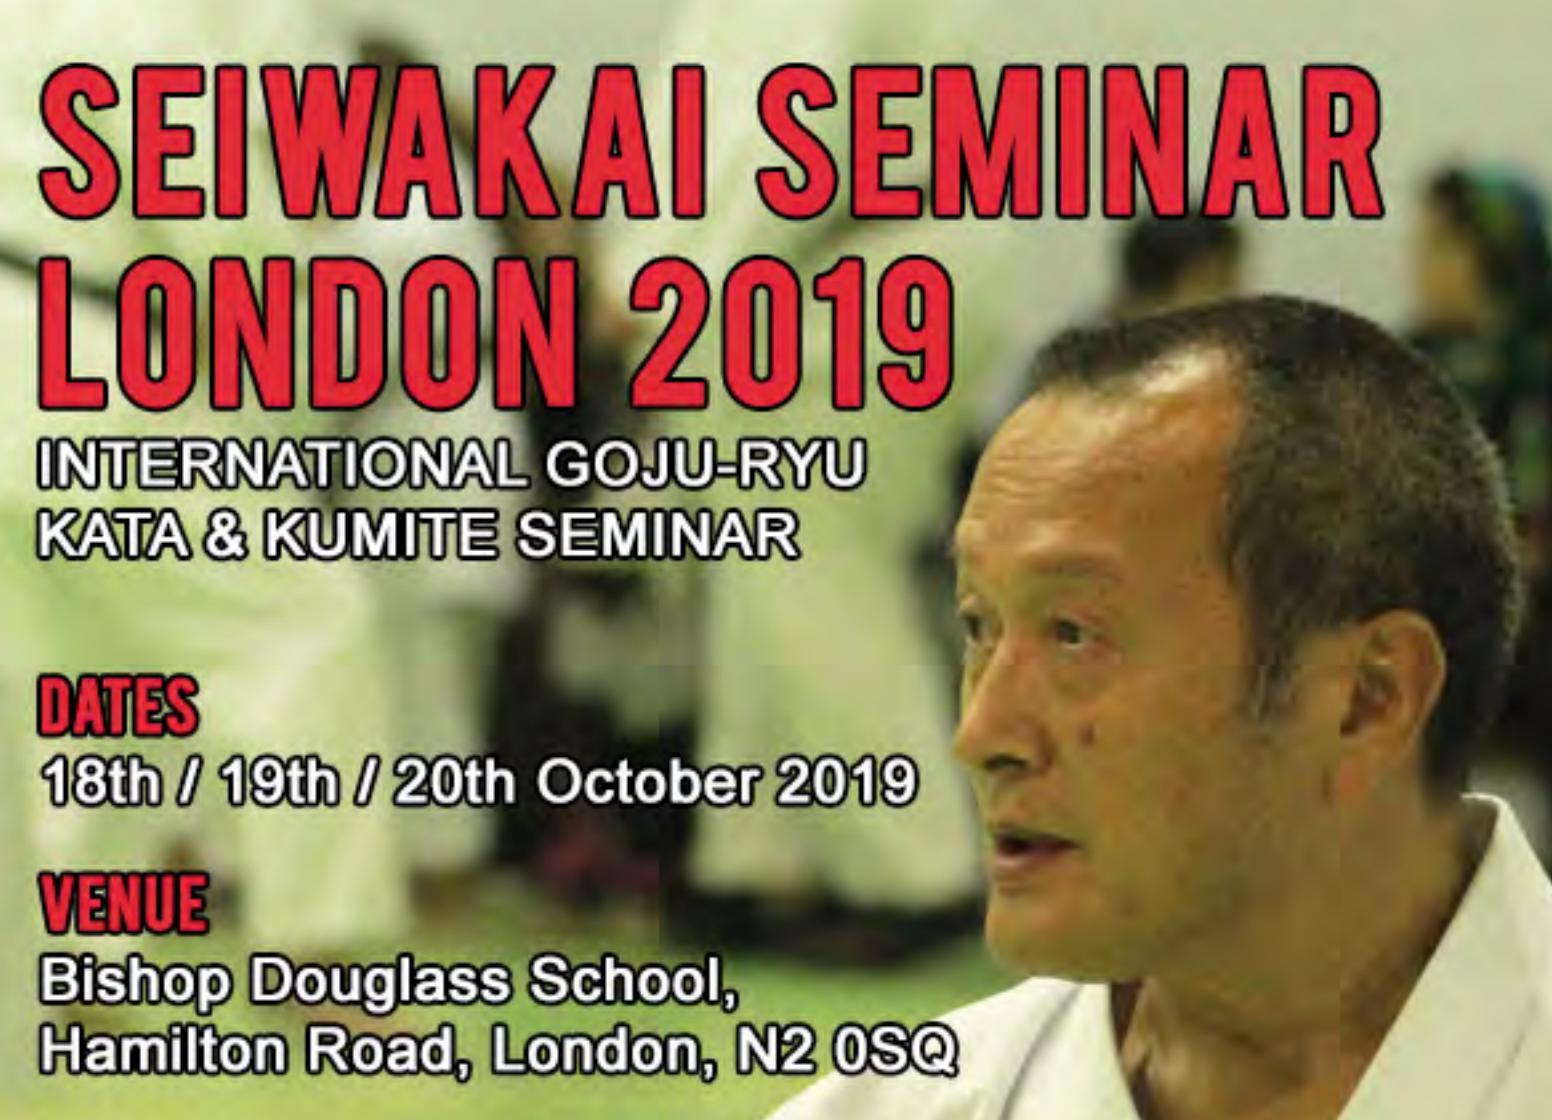 Schermafbeelding 2019 06 04 om 11.20.40 Seiwakai karate seminar in Londen